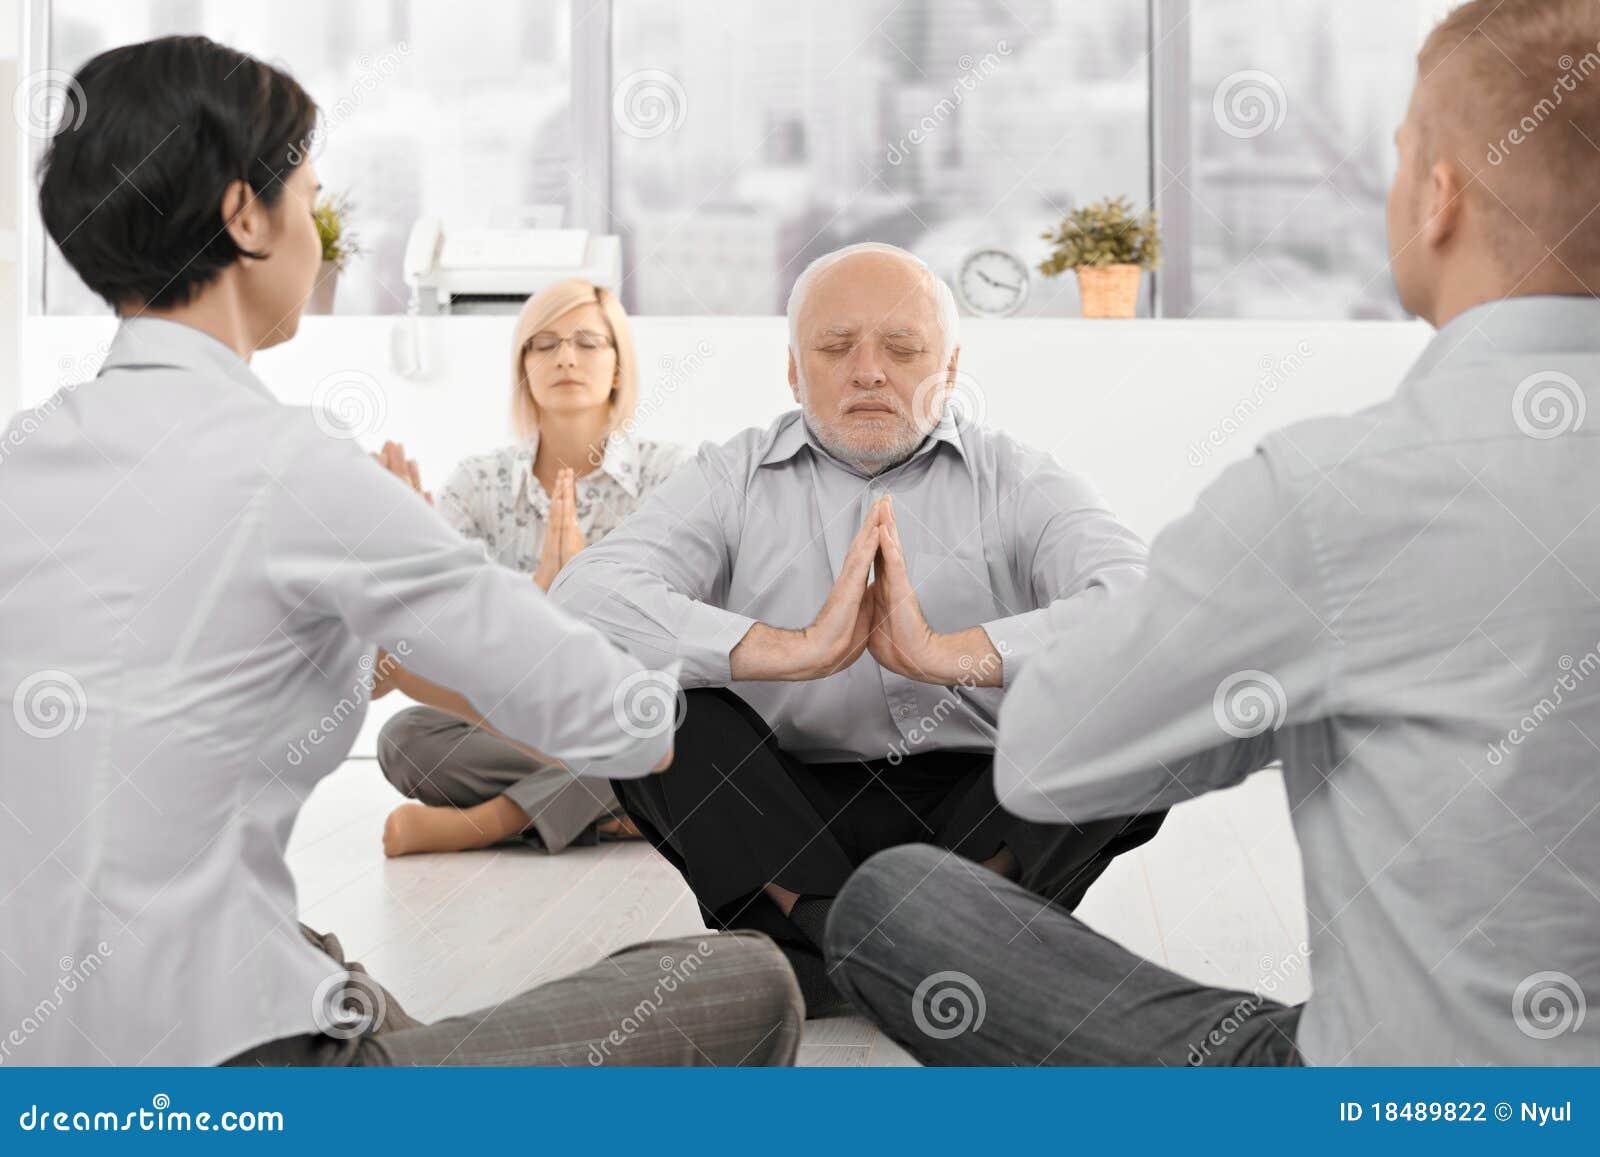 Businesspeople exercising office yoga